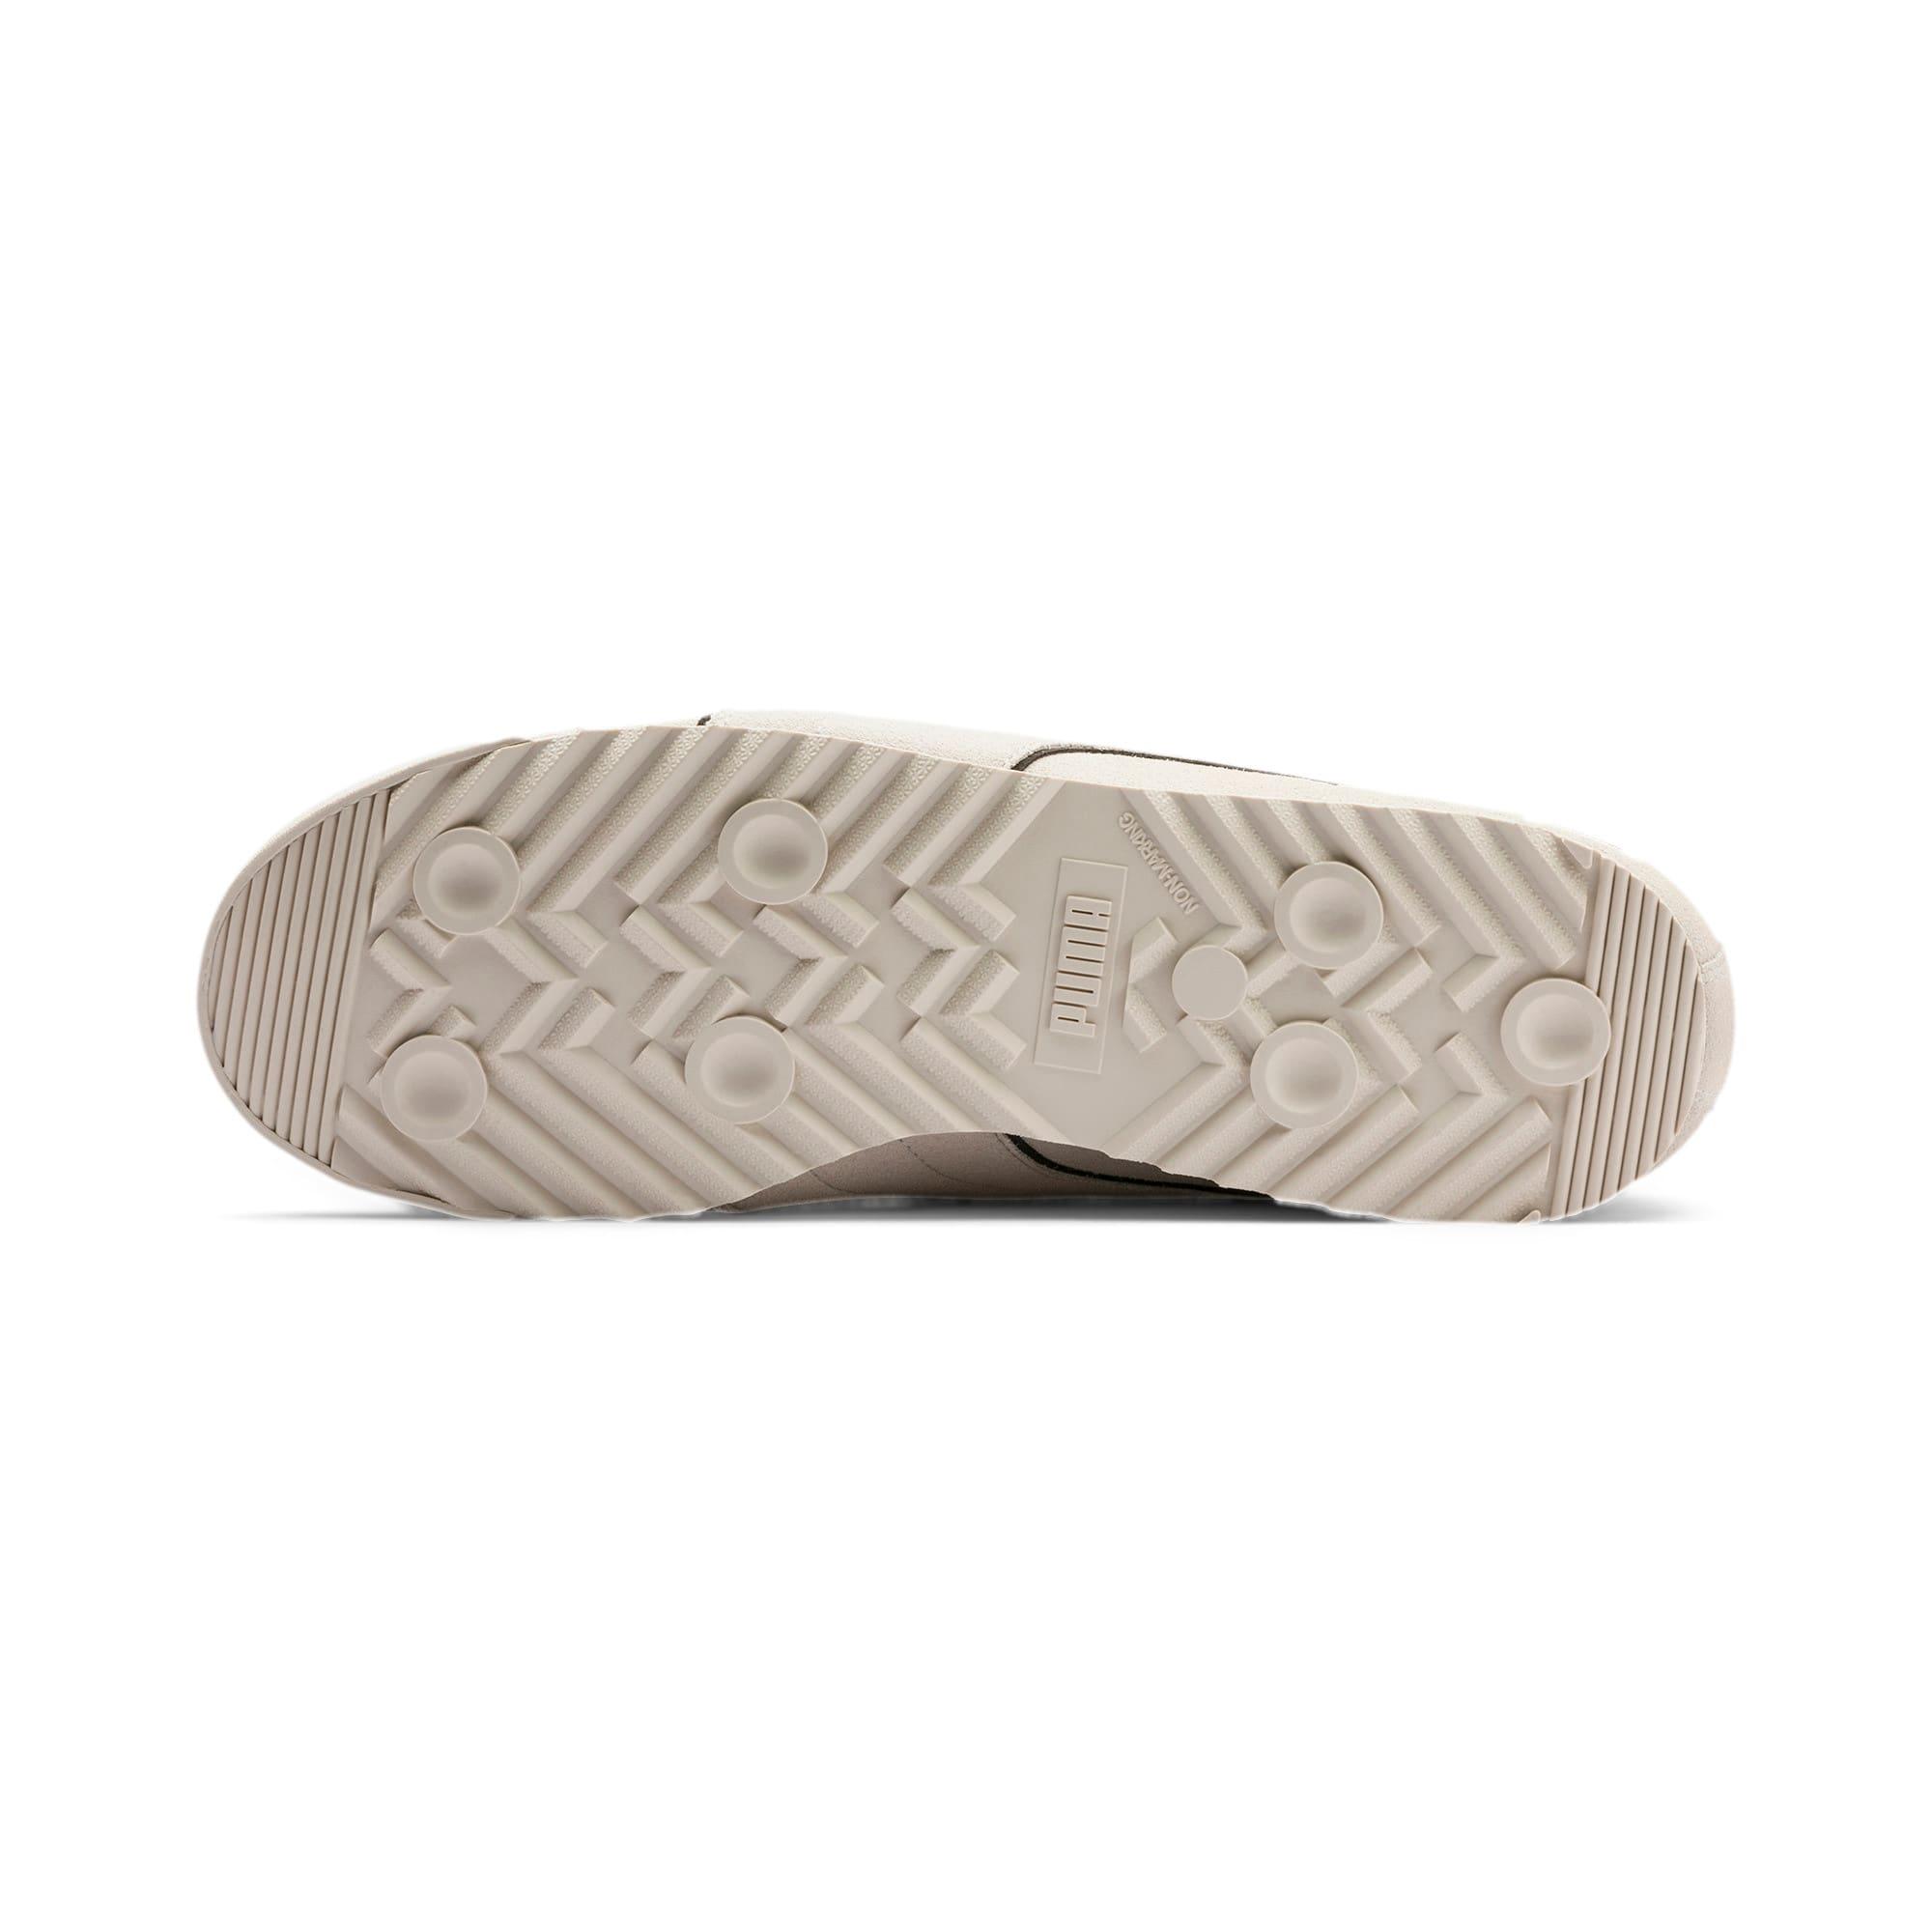 Miniatura 4 de Zapatos deportivos PUMA x THE GODFATHER Roma Woltz, WINDCHIME-Puma negro, mediano